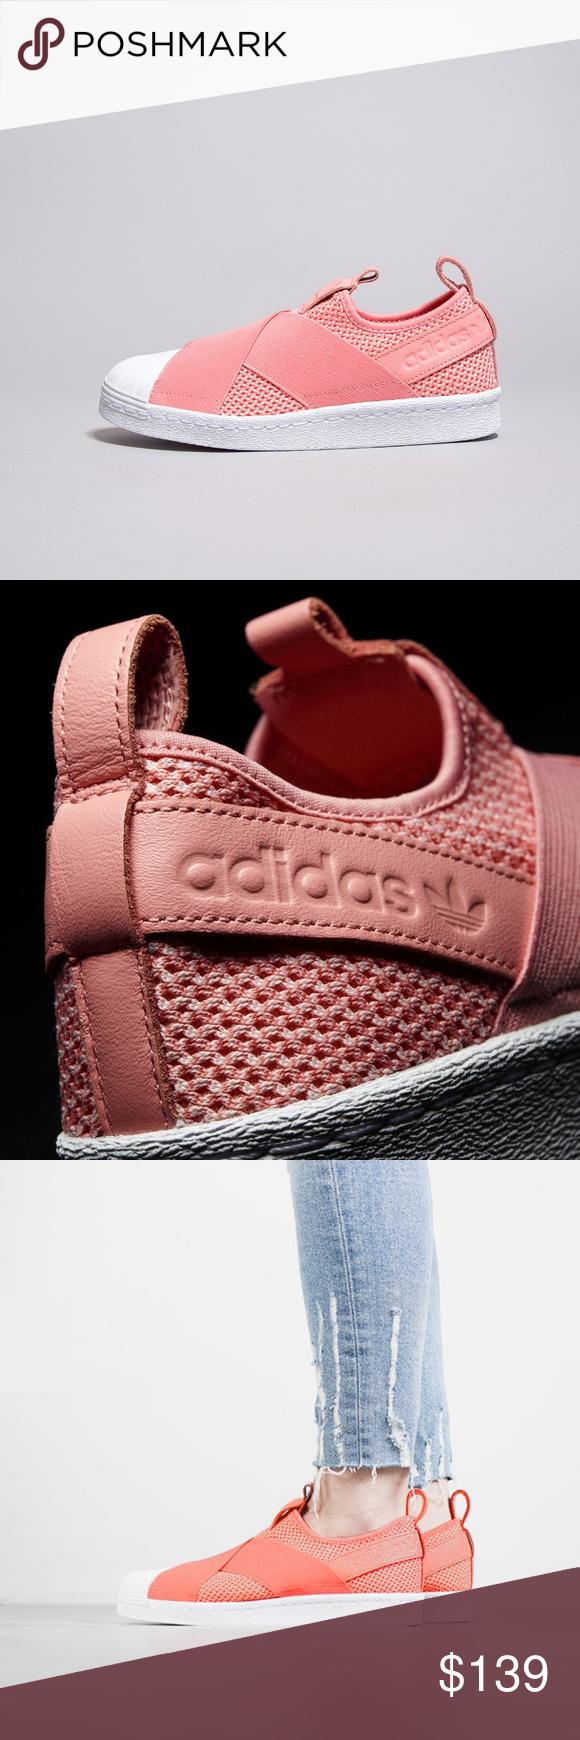 9c1190573e43fe Sneaker. Adidas ORGINALS Superstar Slipon Womens size 7.5 Adidas ORGINALS  Superstar Slip-on Womens size 7.5